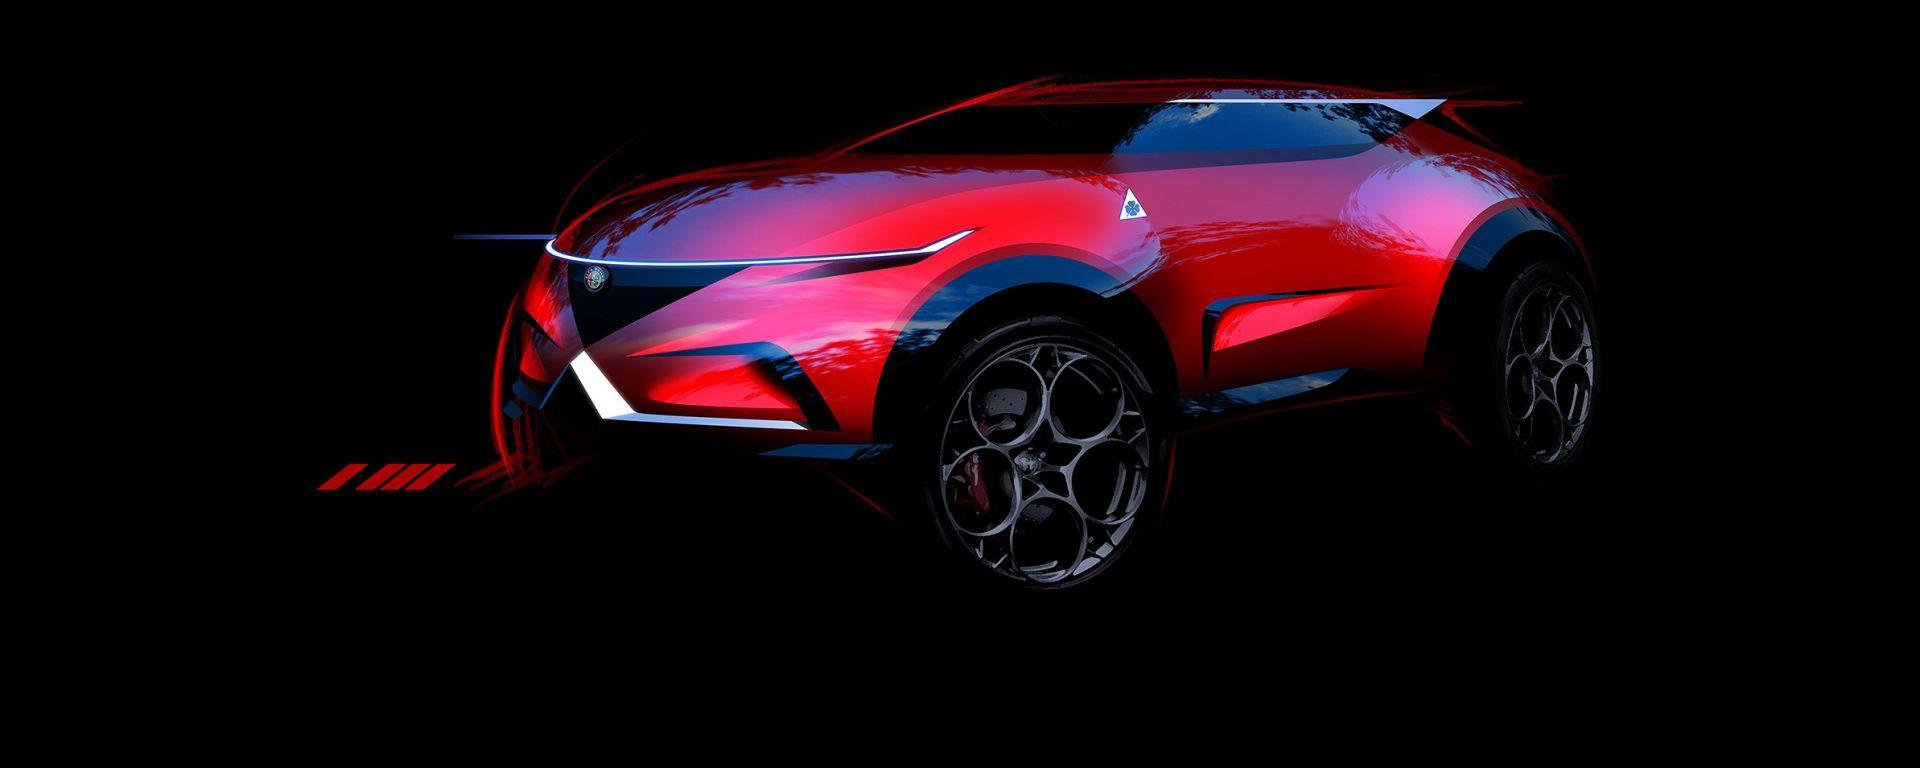 Come sarà l'Alfa Romeo Brennero? Un concept del designer Minwoong Im